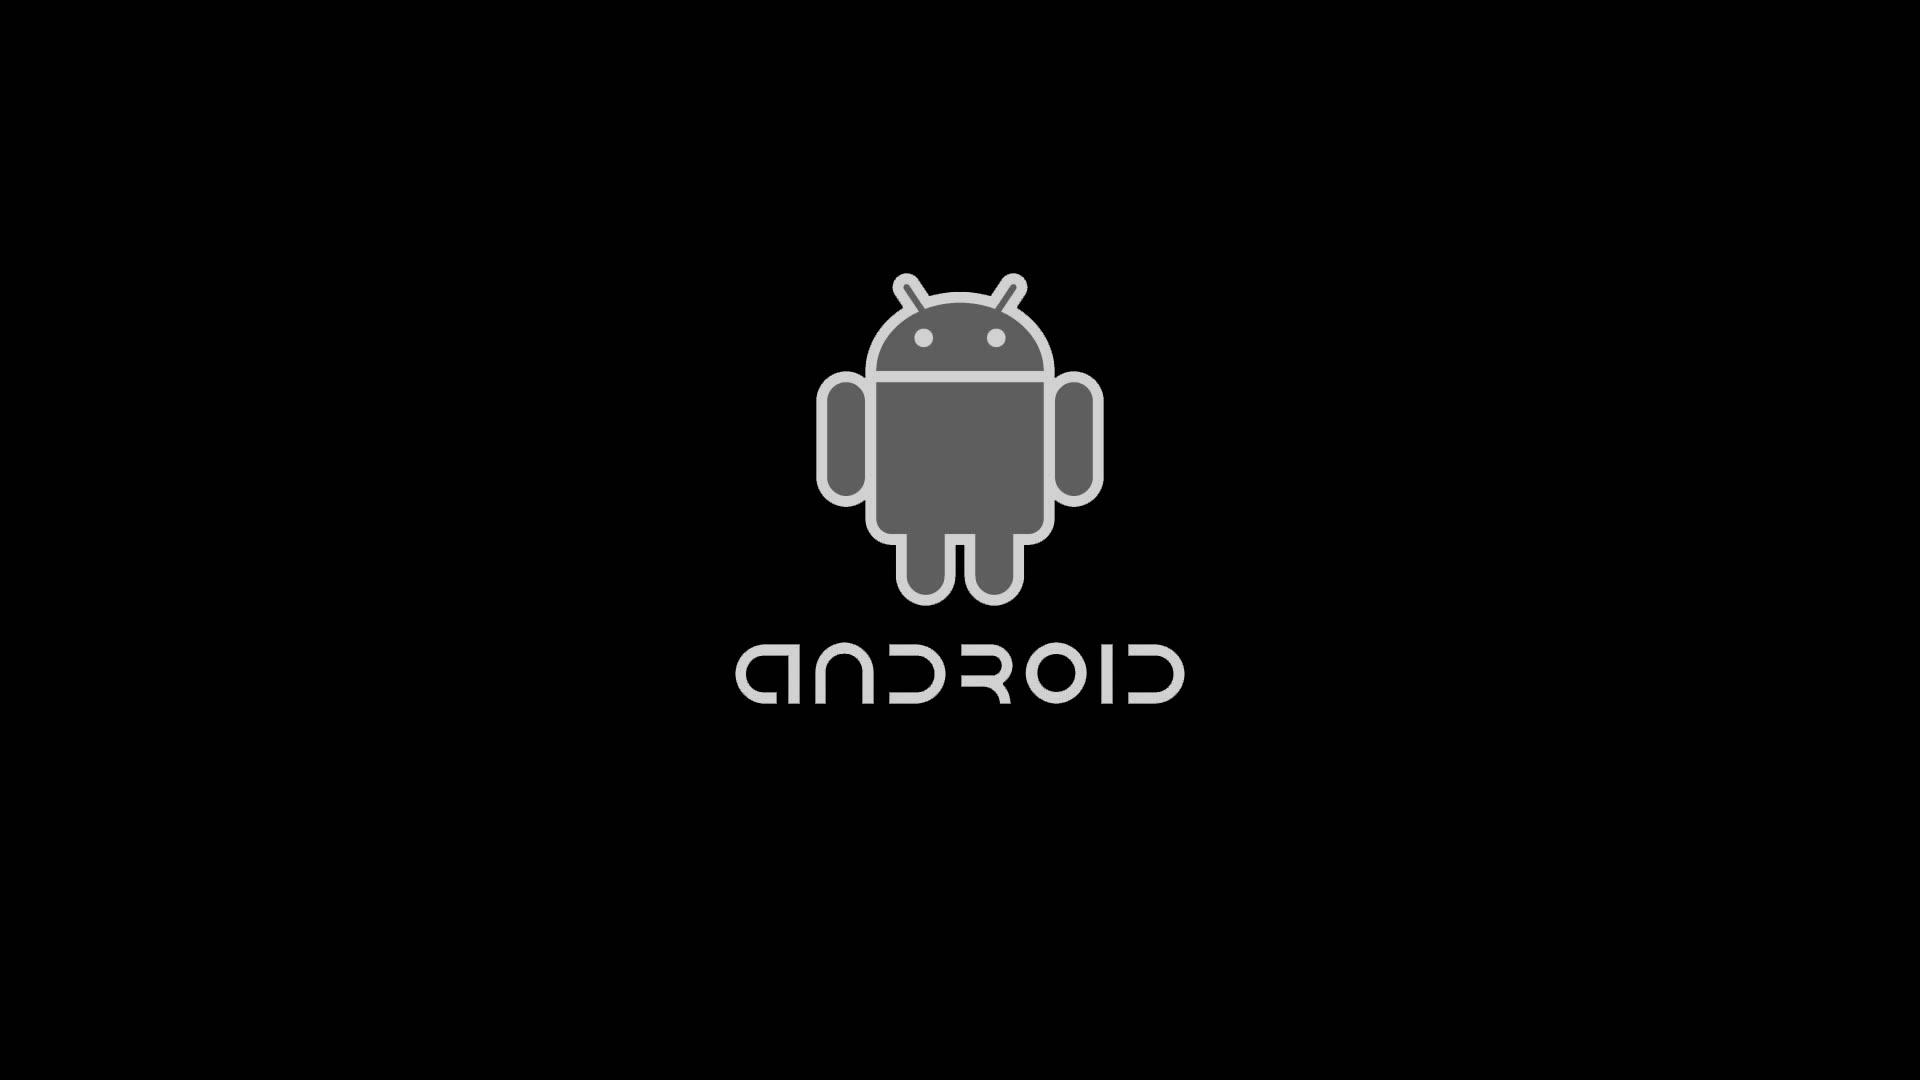 black wallpapers android wallpaper mac 1920x1080 1920x1080